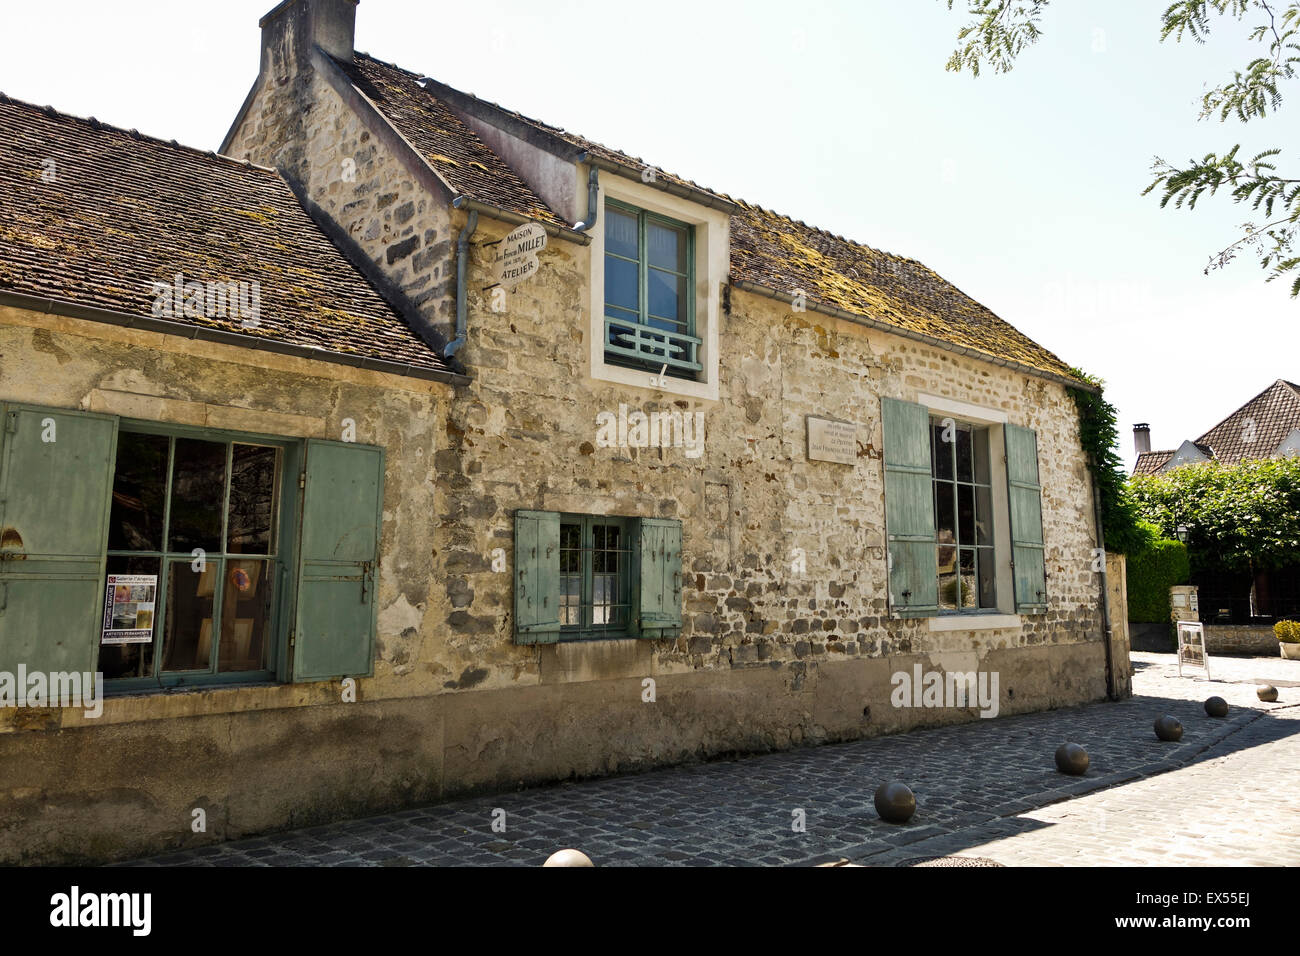 Studio and house of French painter Jean-François Millet, Barbizon, Seine-et-Marne, France. - Stock Image